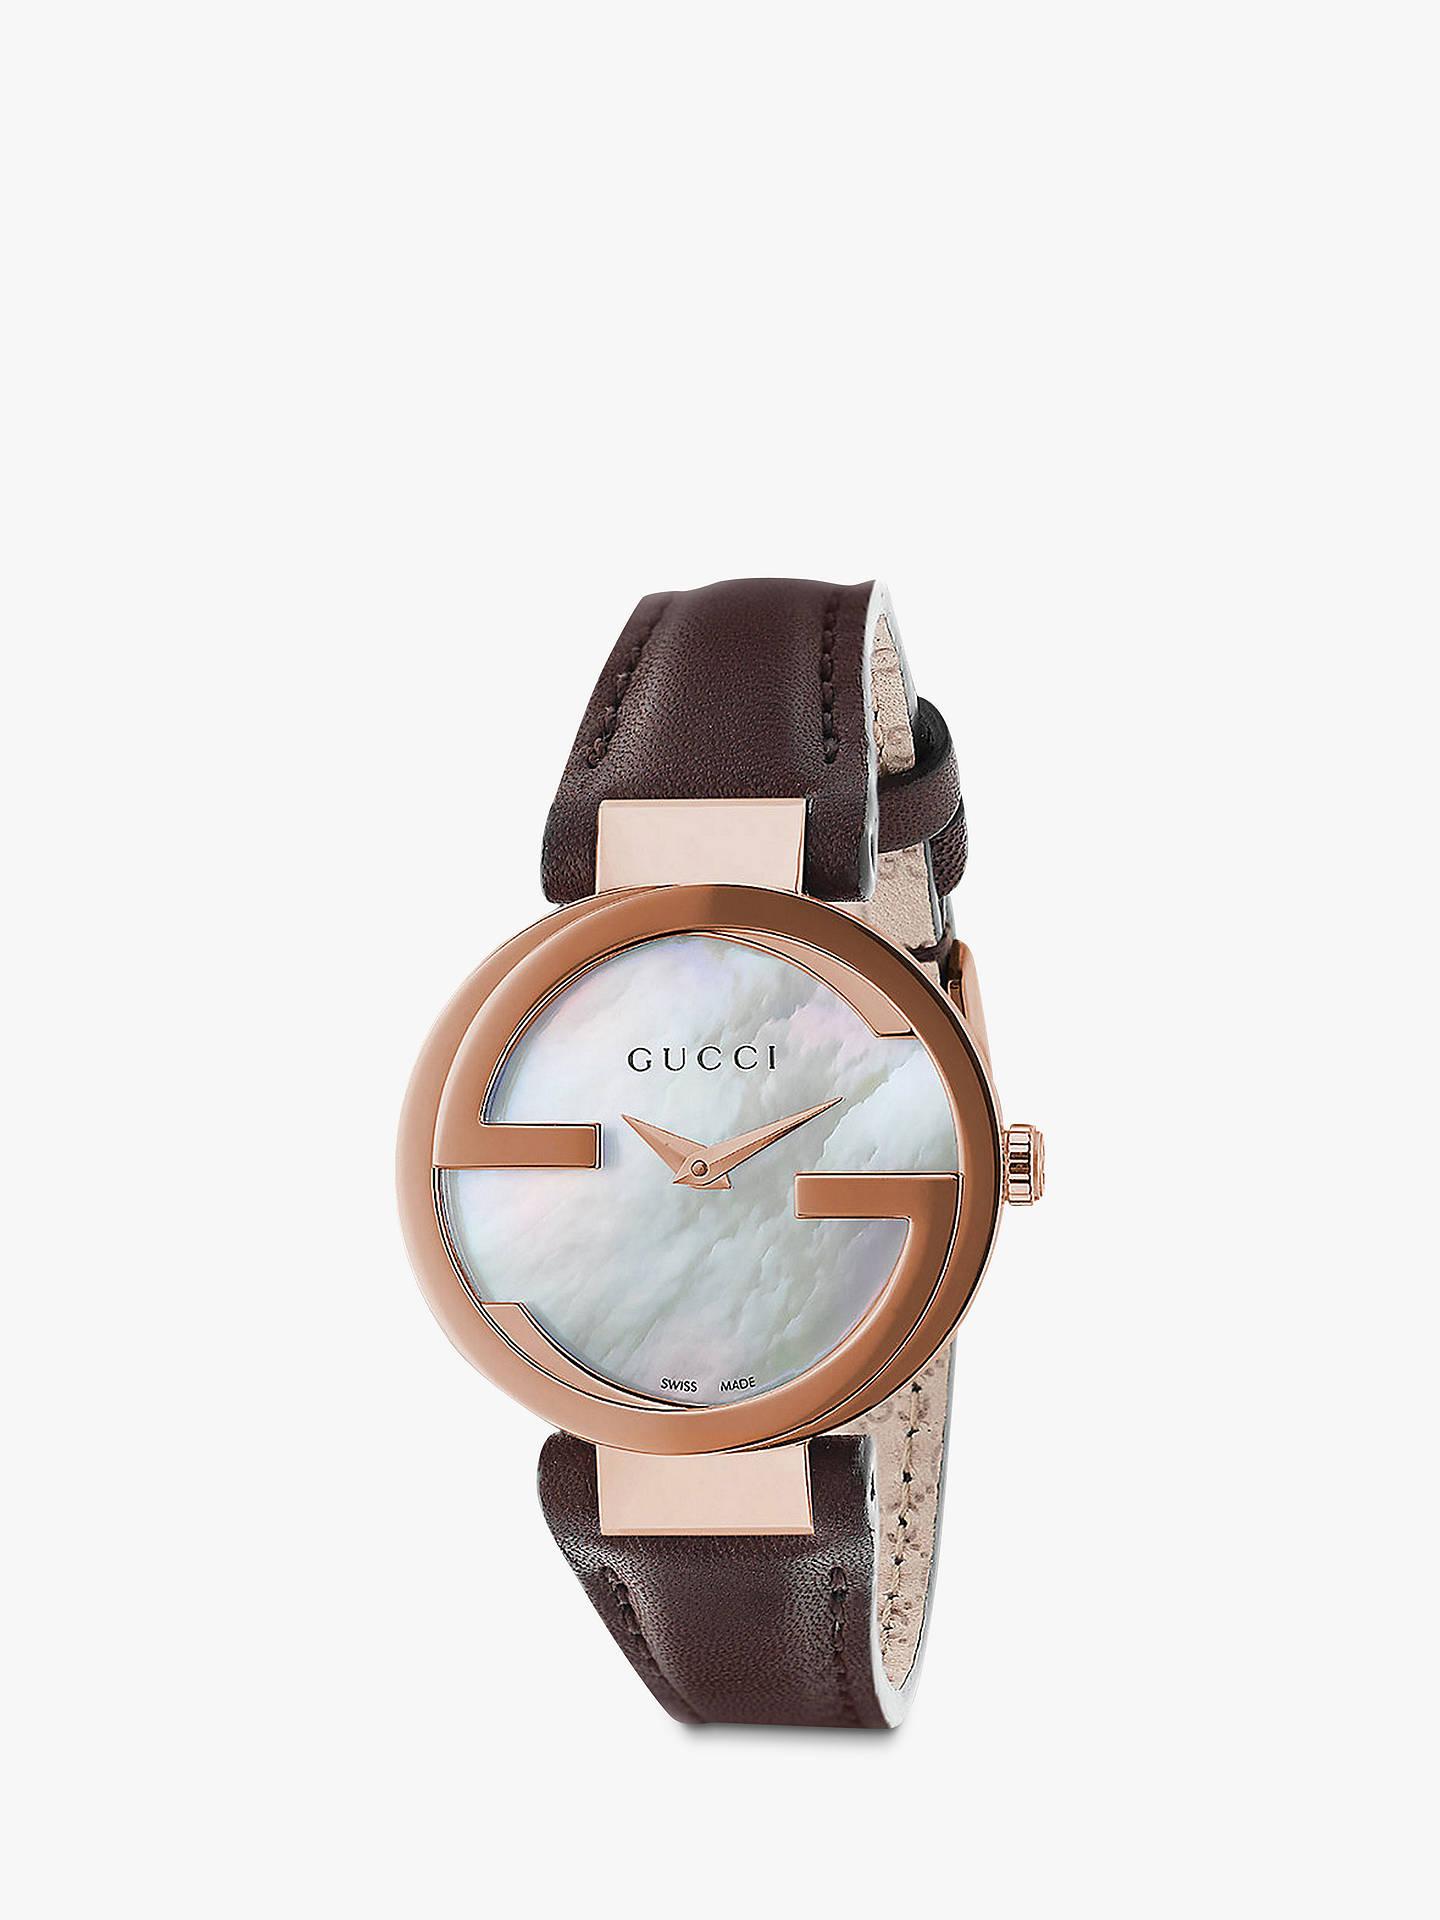 a3bc2b701d2 Buy Gucci YA133516 Women s Interlocking G Leather Strap Watch